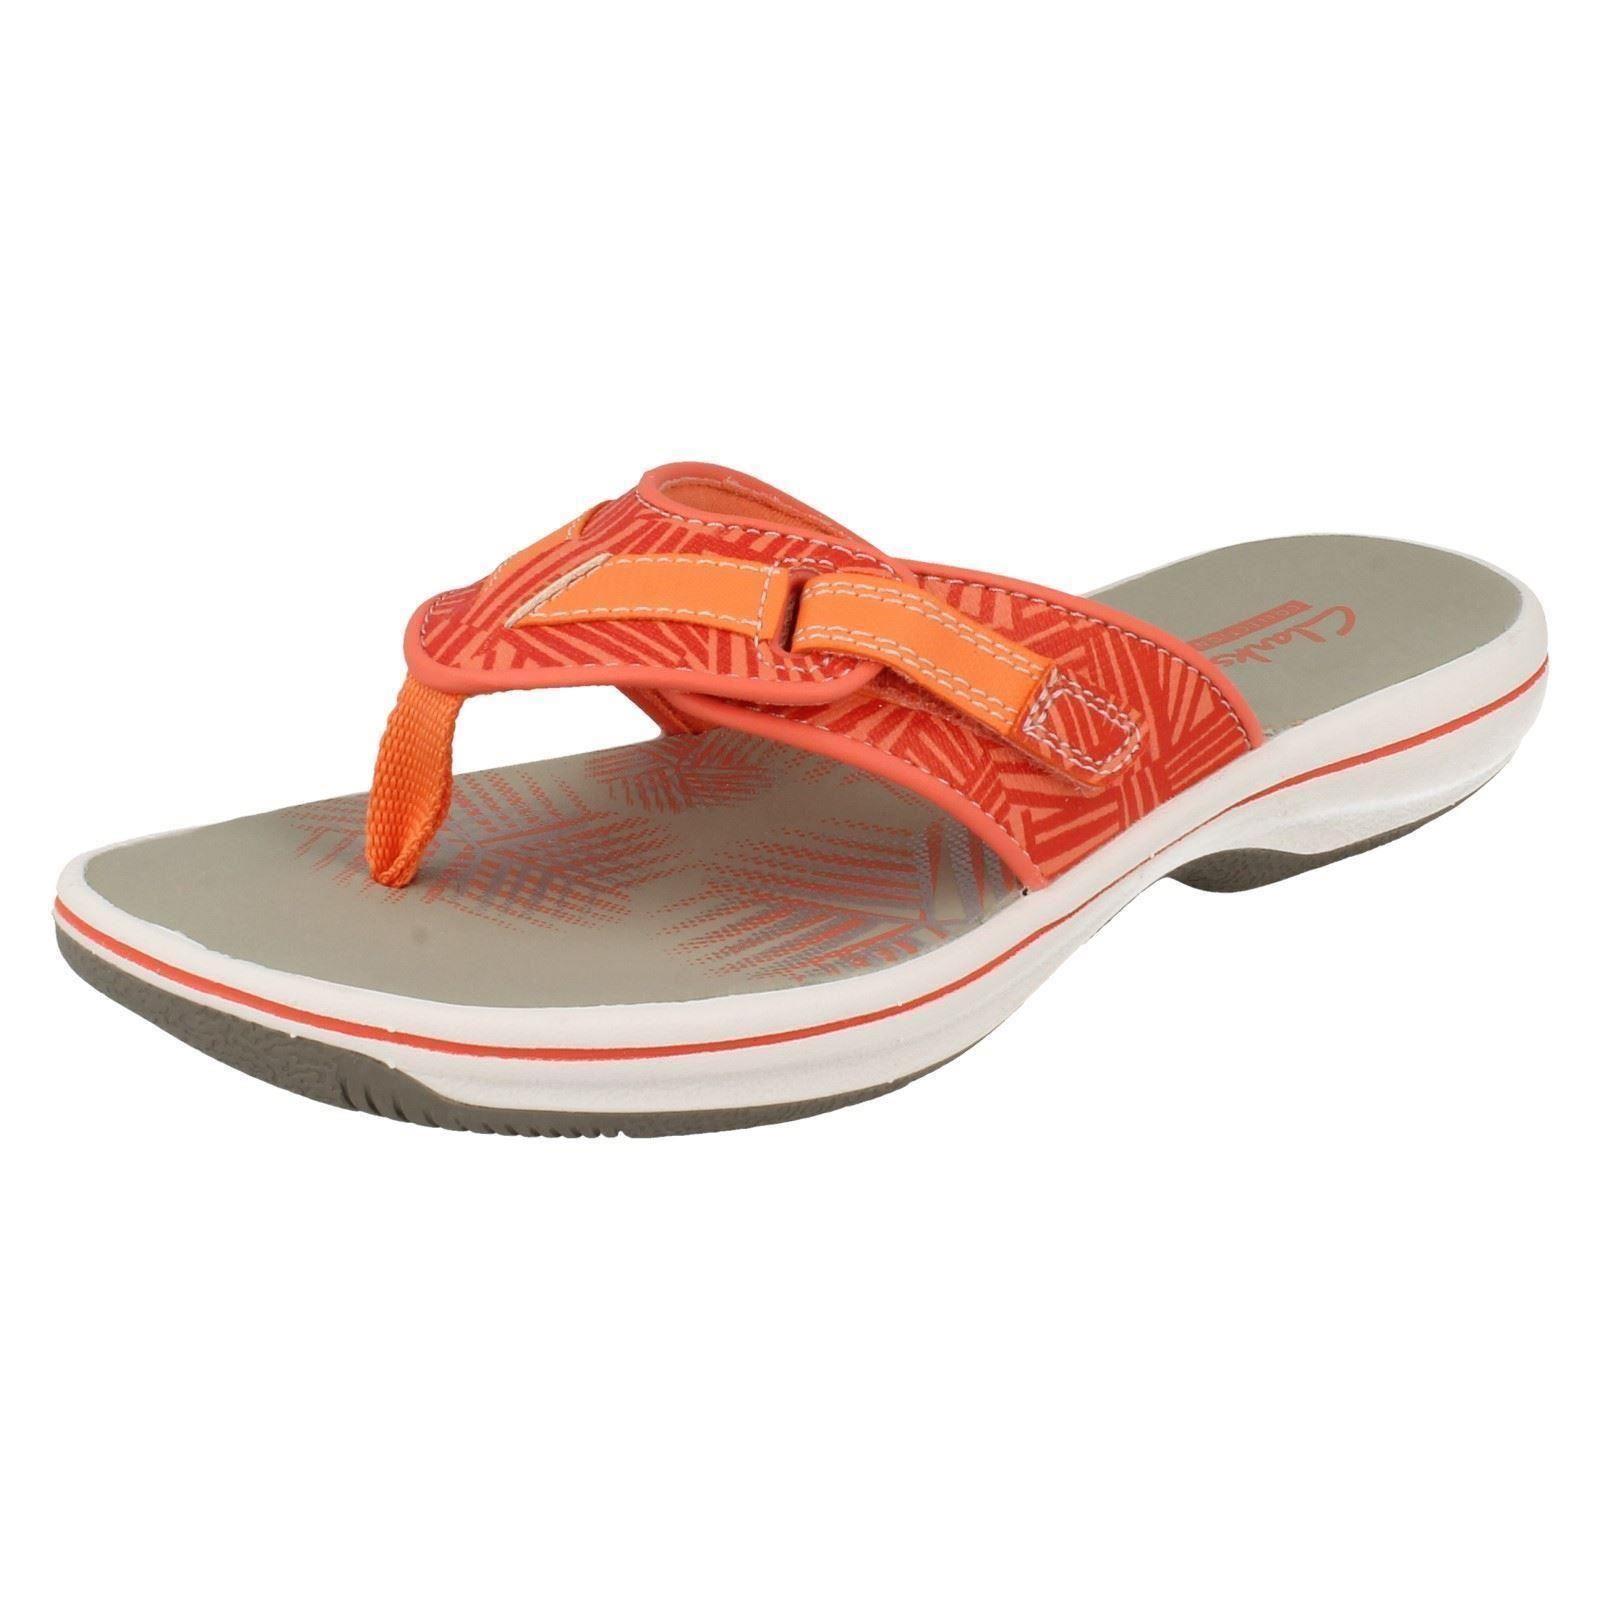 Clarks Sandalias Quade para Summer naranja Post Brinkley mujer Toe v7qwS7a